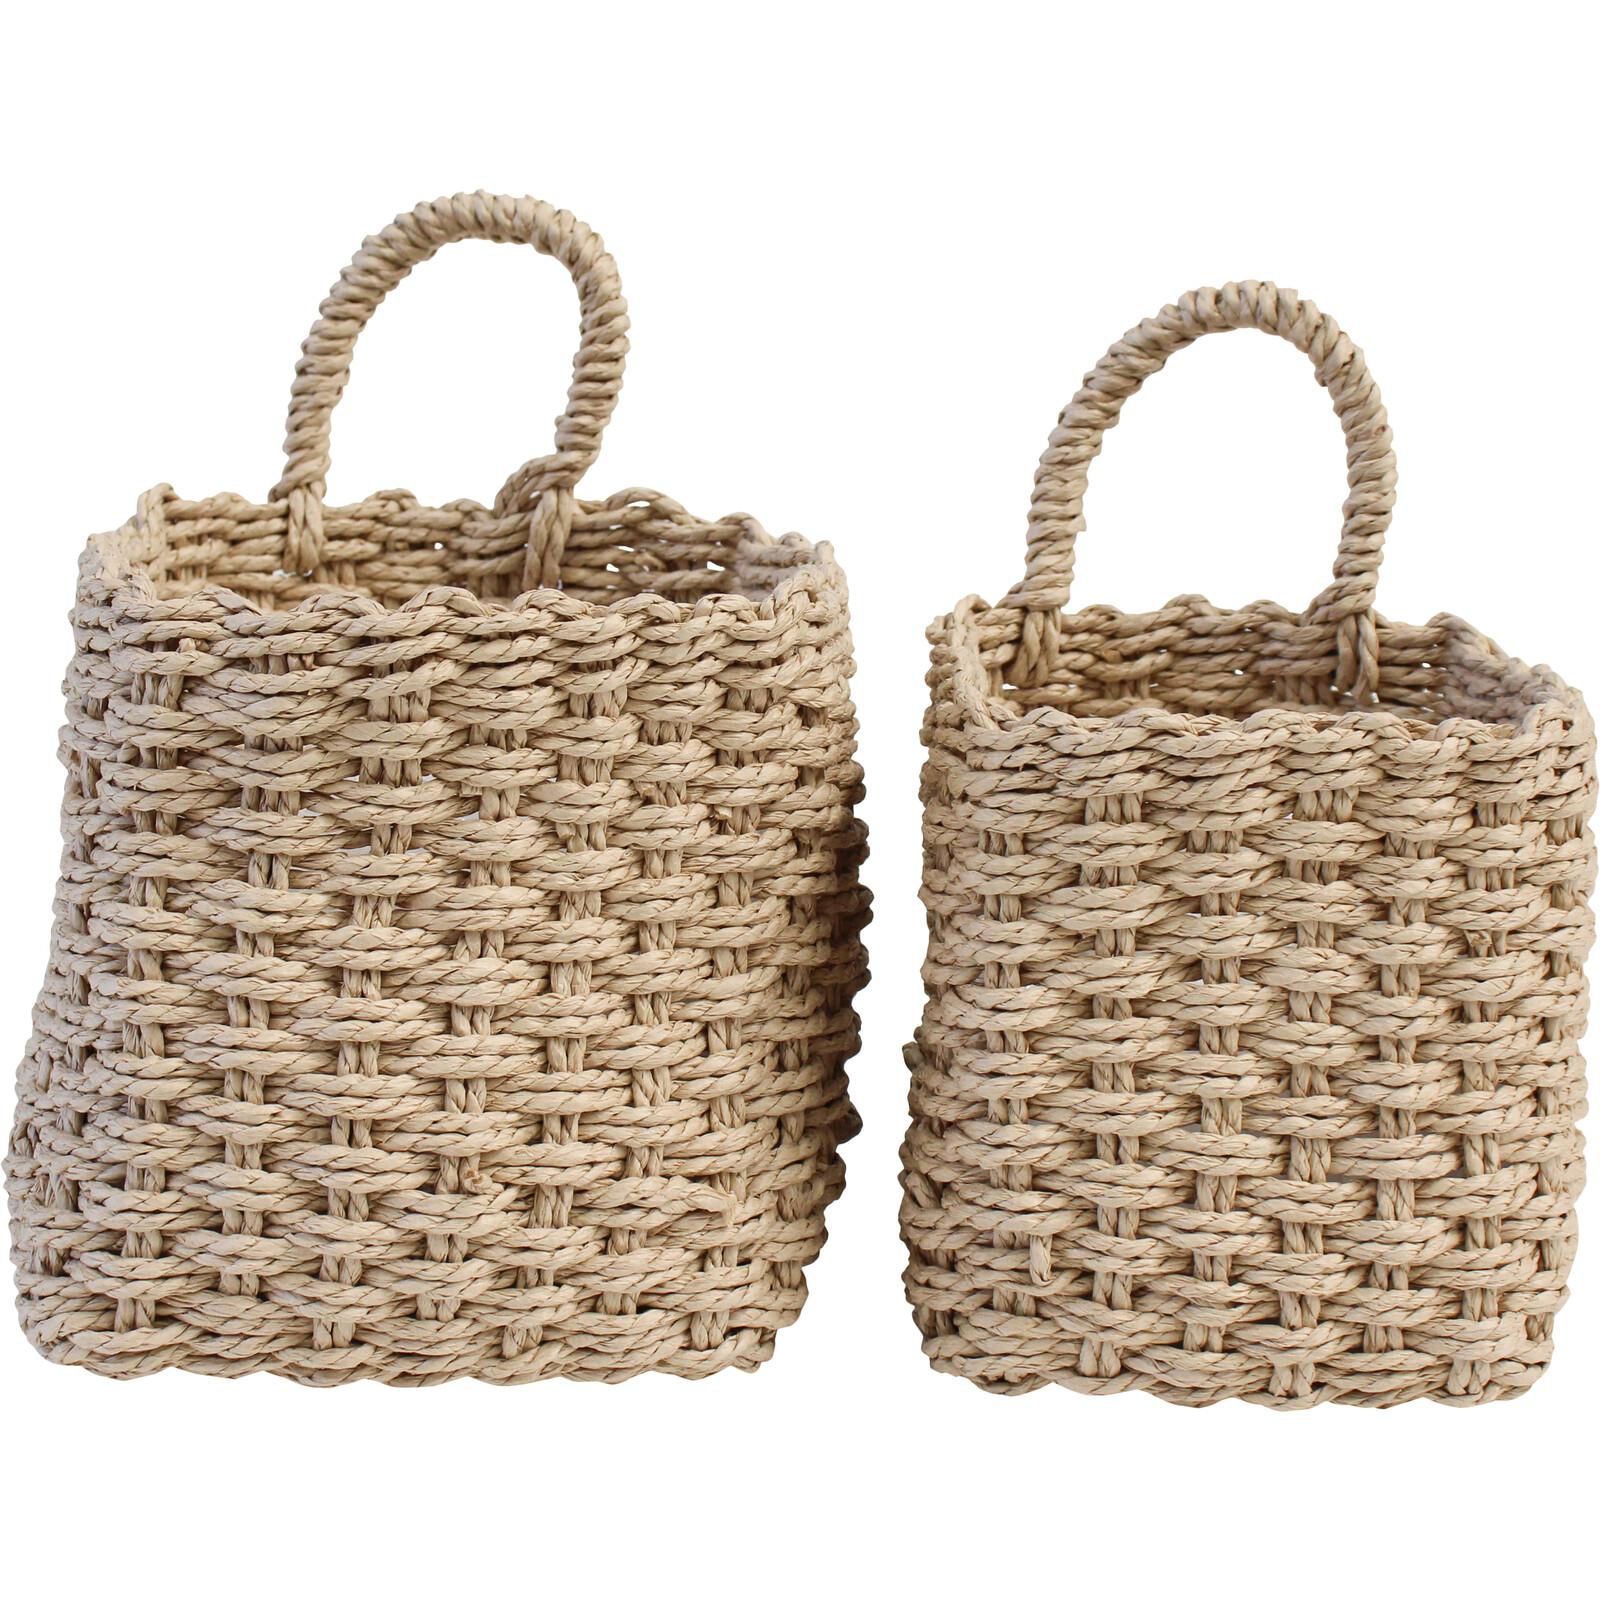 Tidy Basket Sq S/2 Bleach